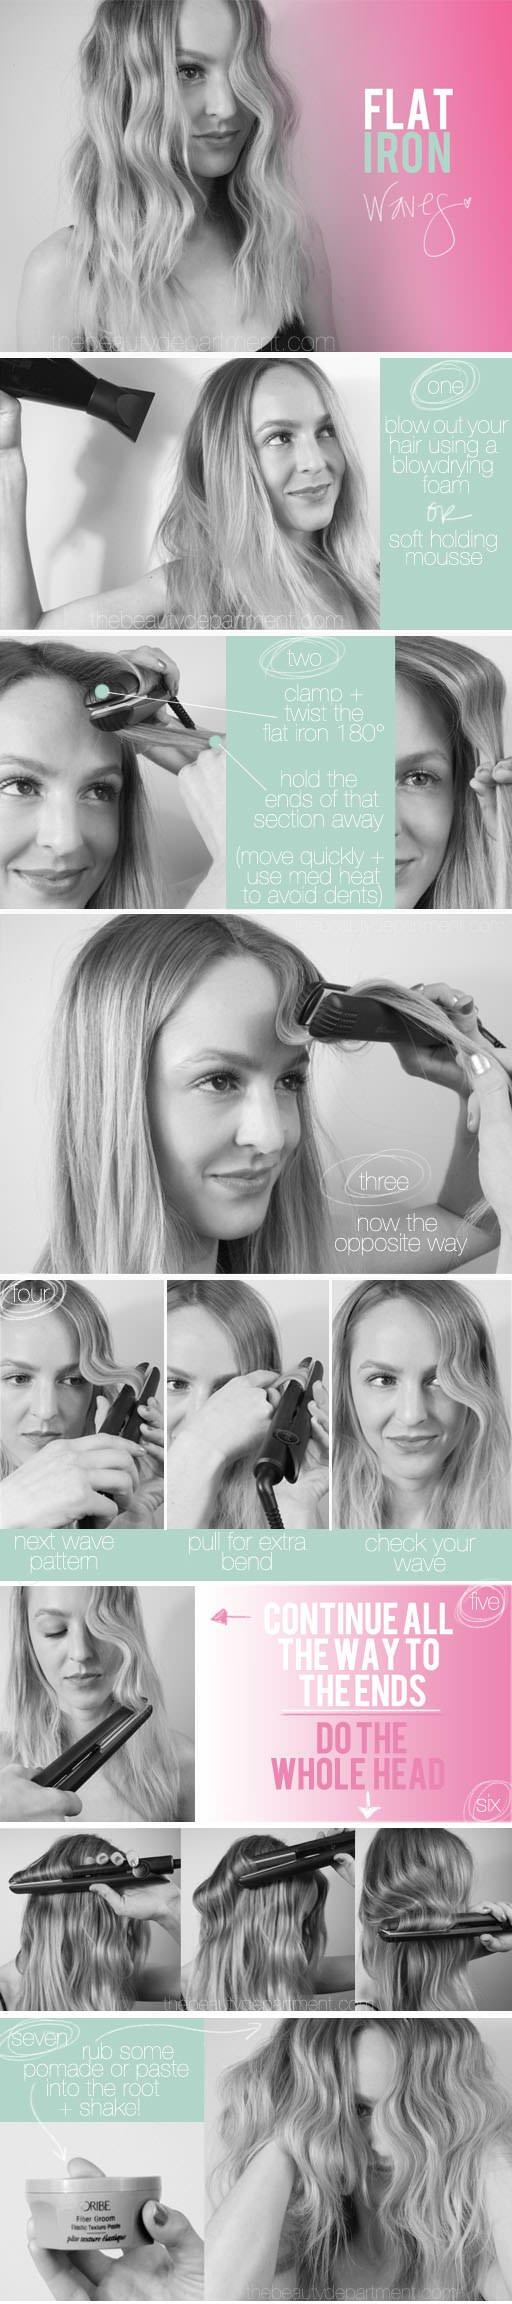 flat iron wavy hair